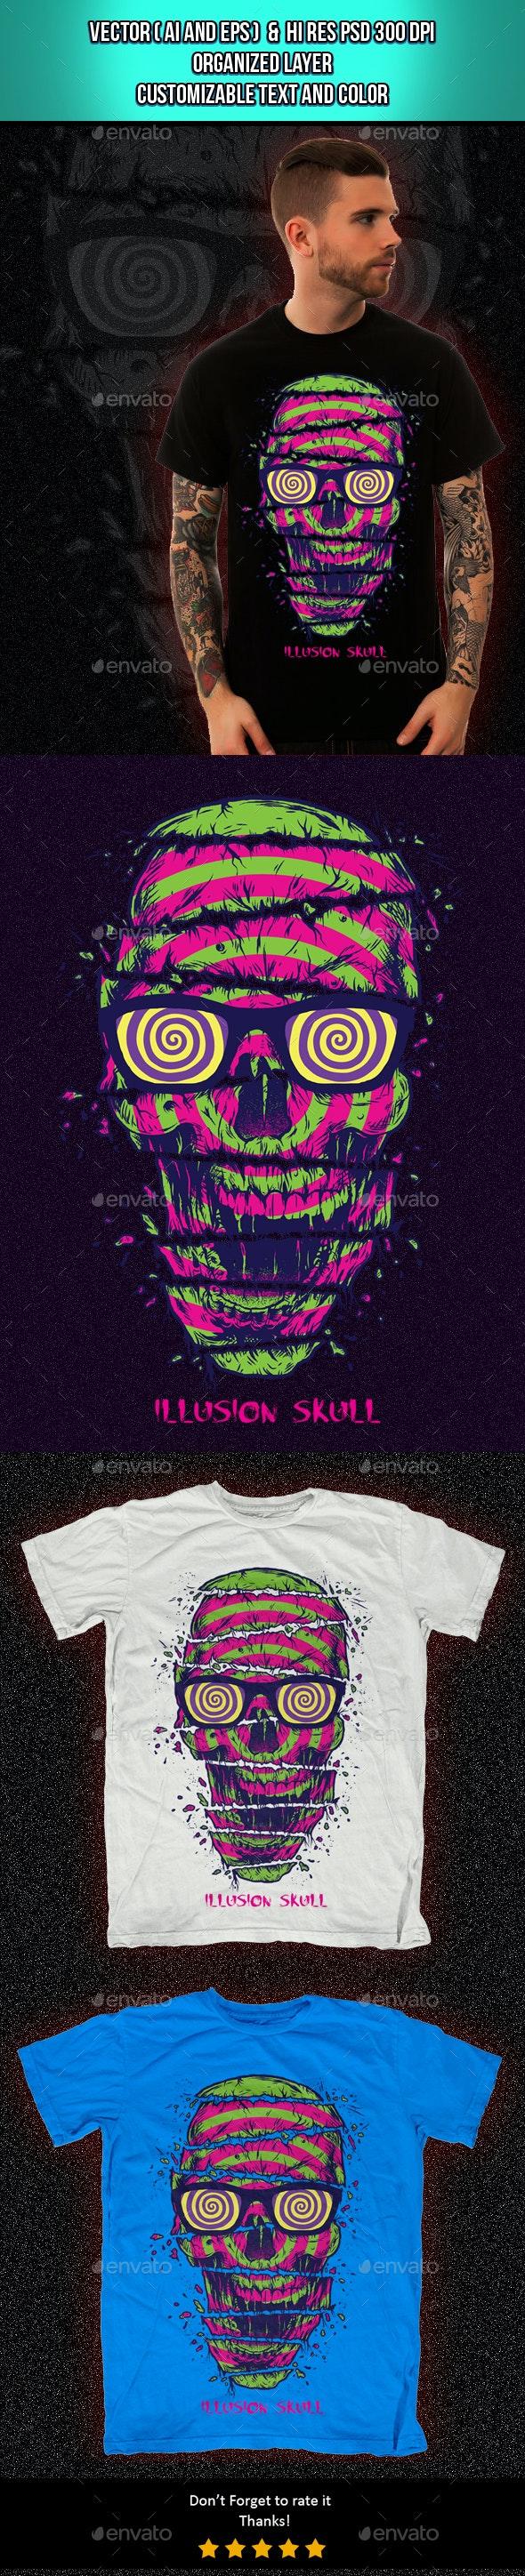 Illusion Skull - Funny Designs